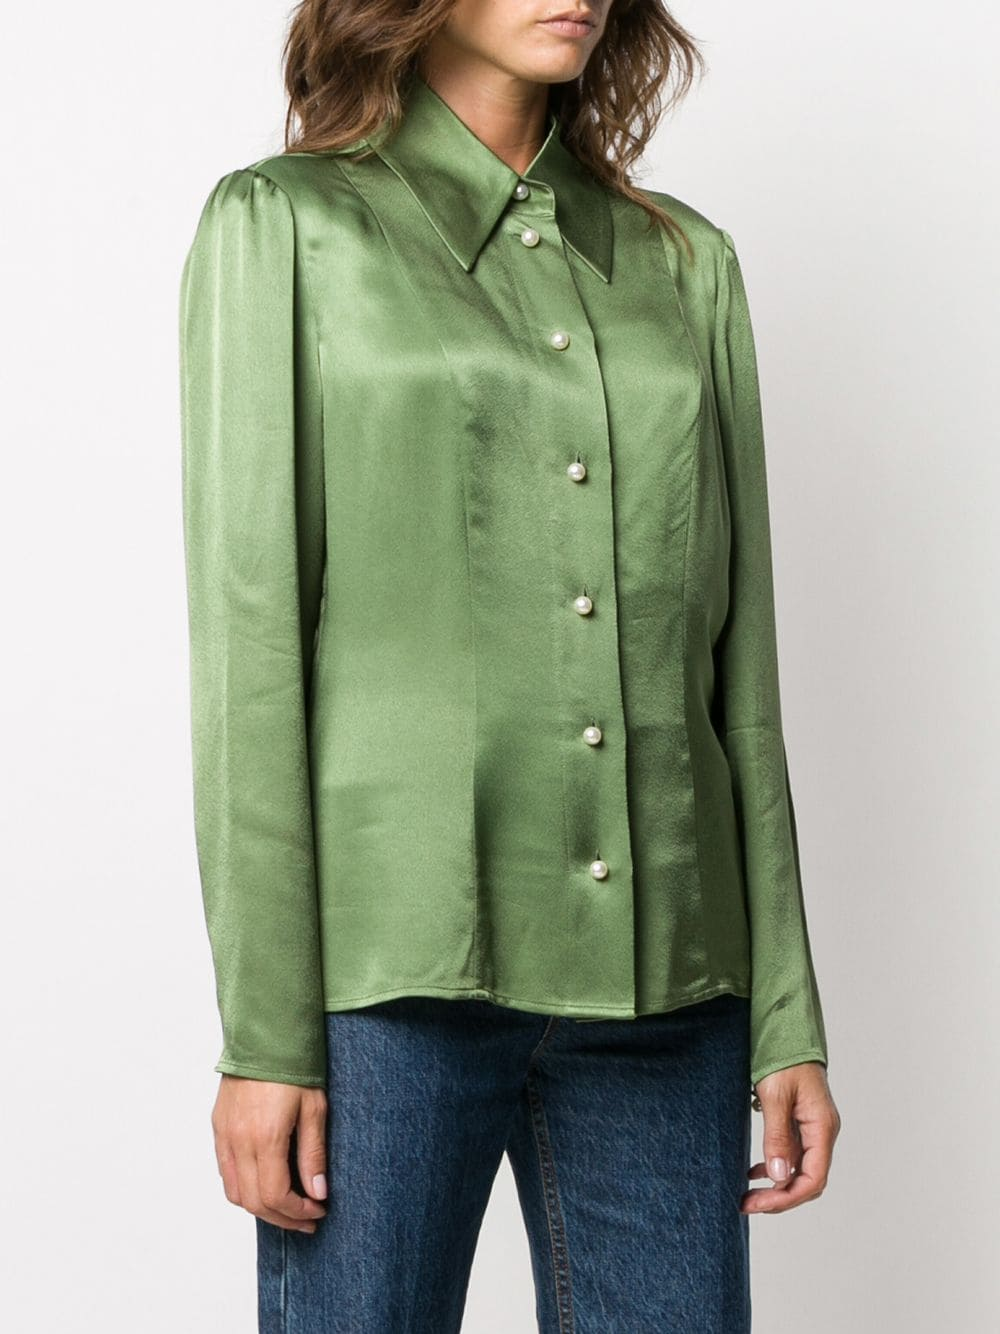 Picture of Alexa Chung   Clapton Saatin Shirt